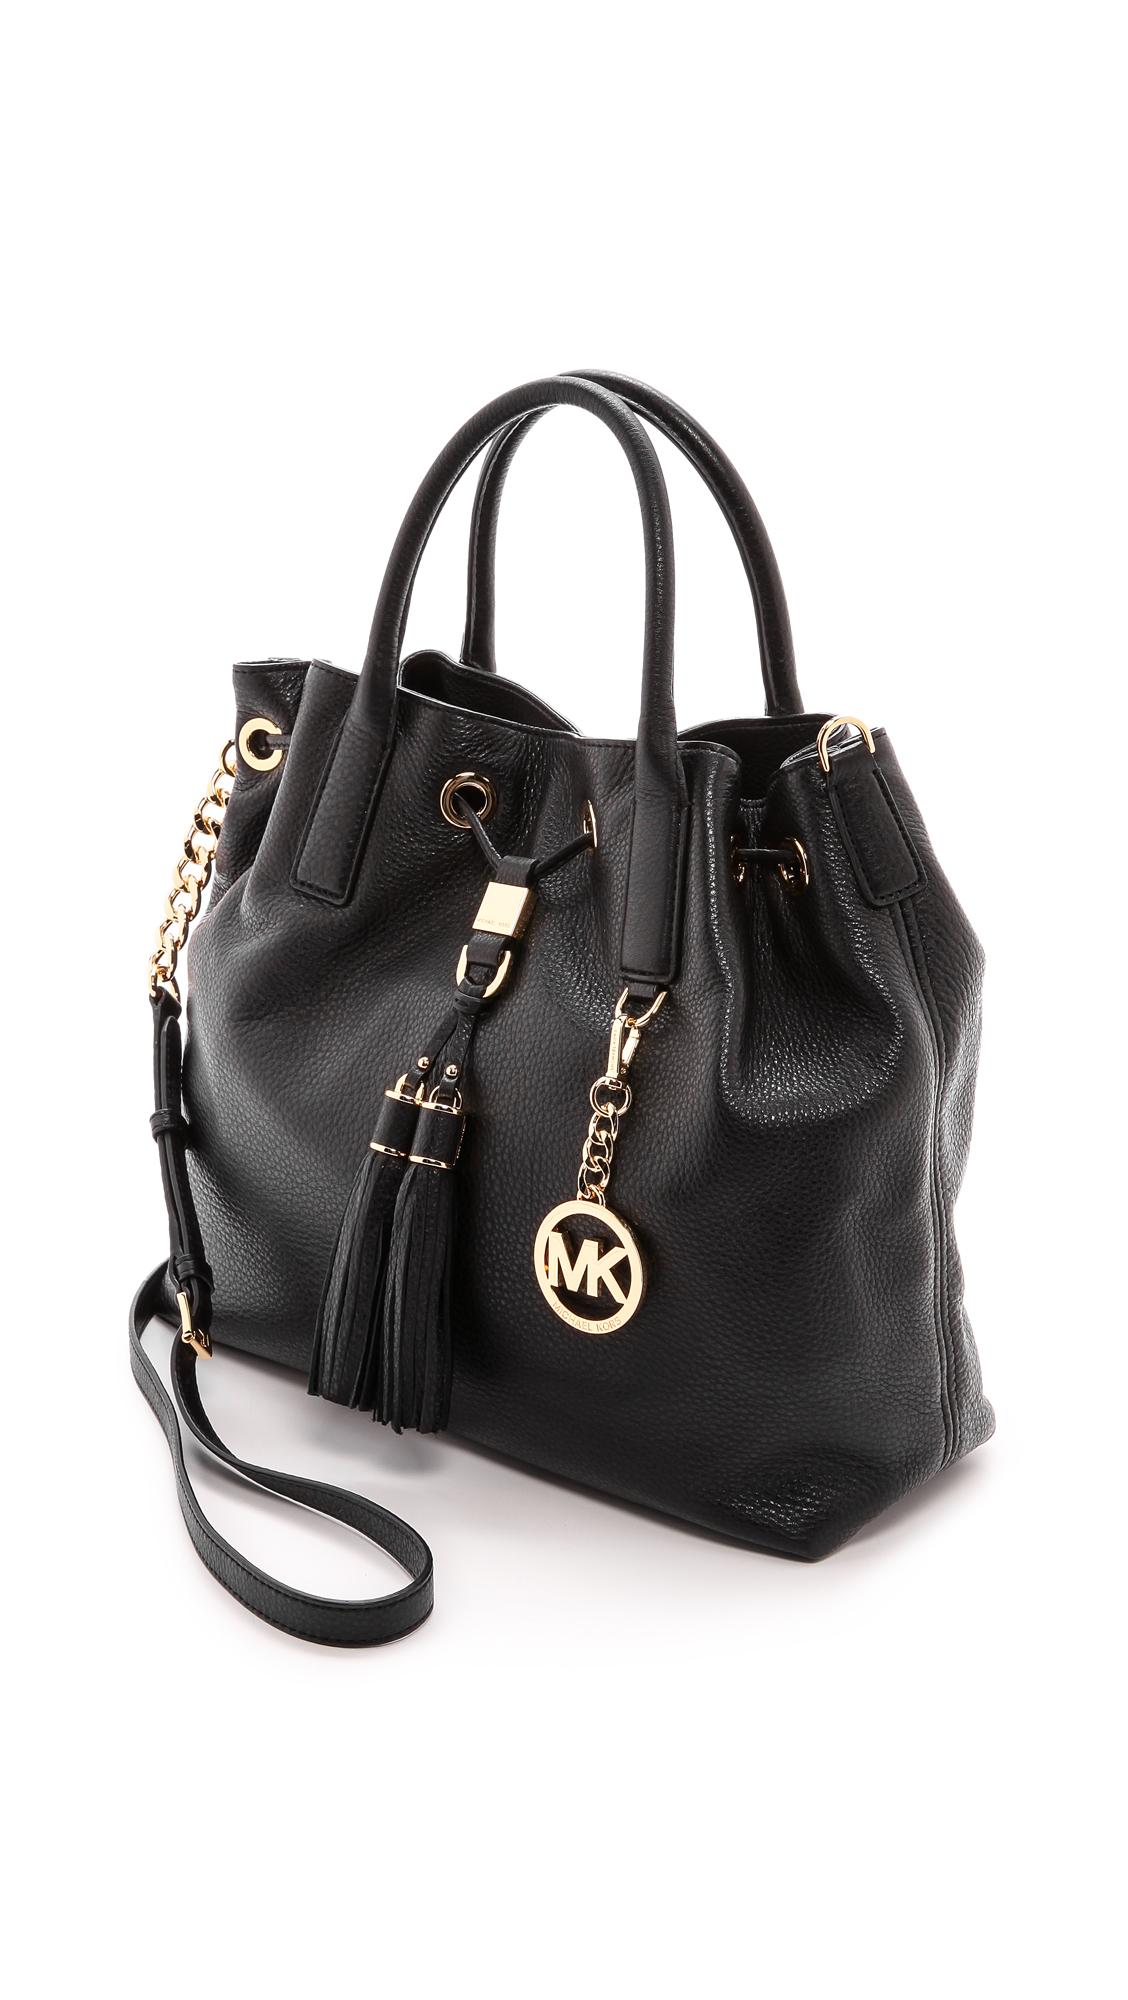 025e4d9247633d ... wholesale lyst michael michael kors camden large drawstring satchel  black in black dd764 67ce1